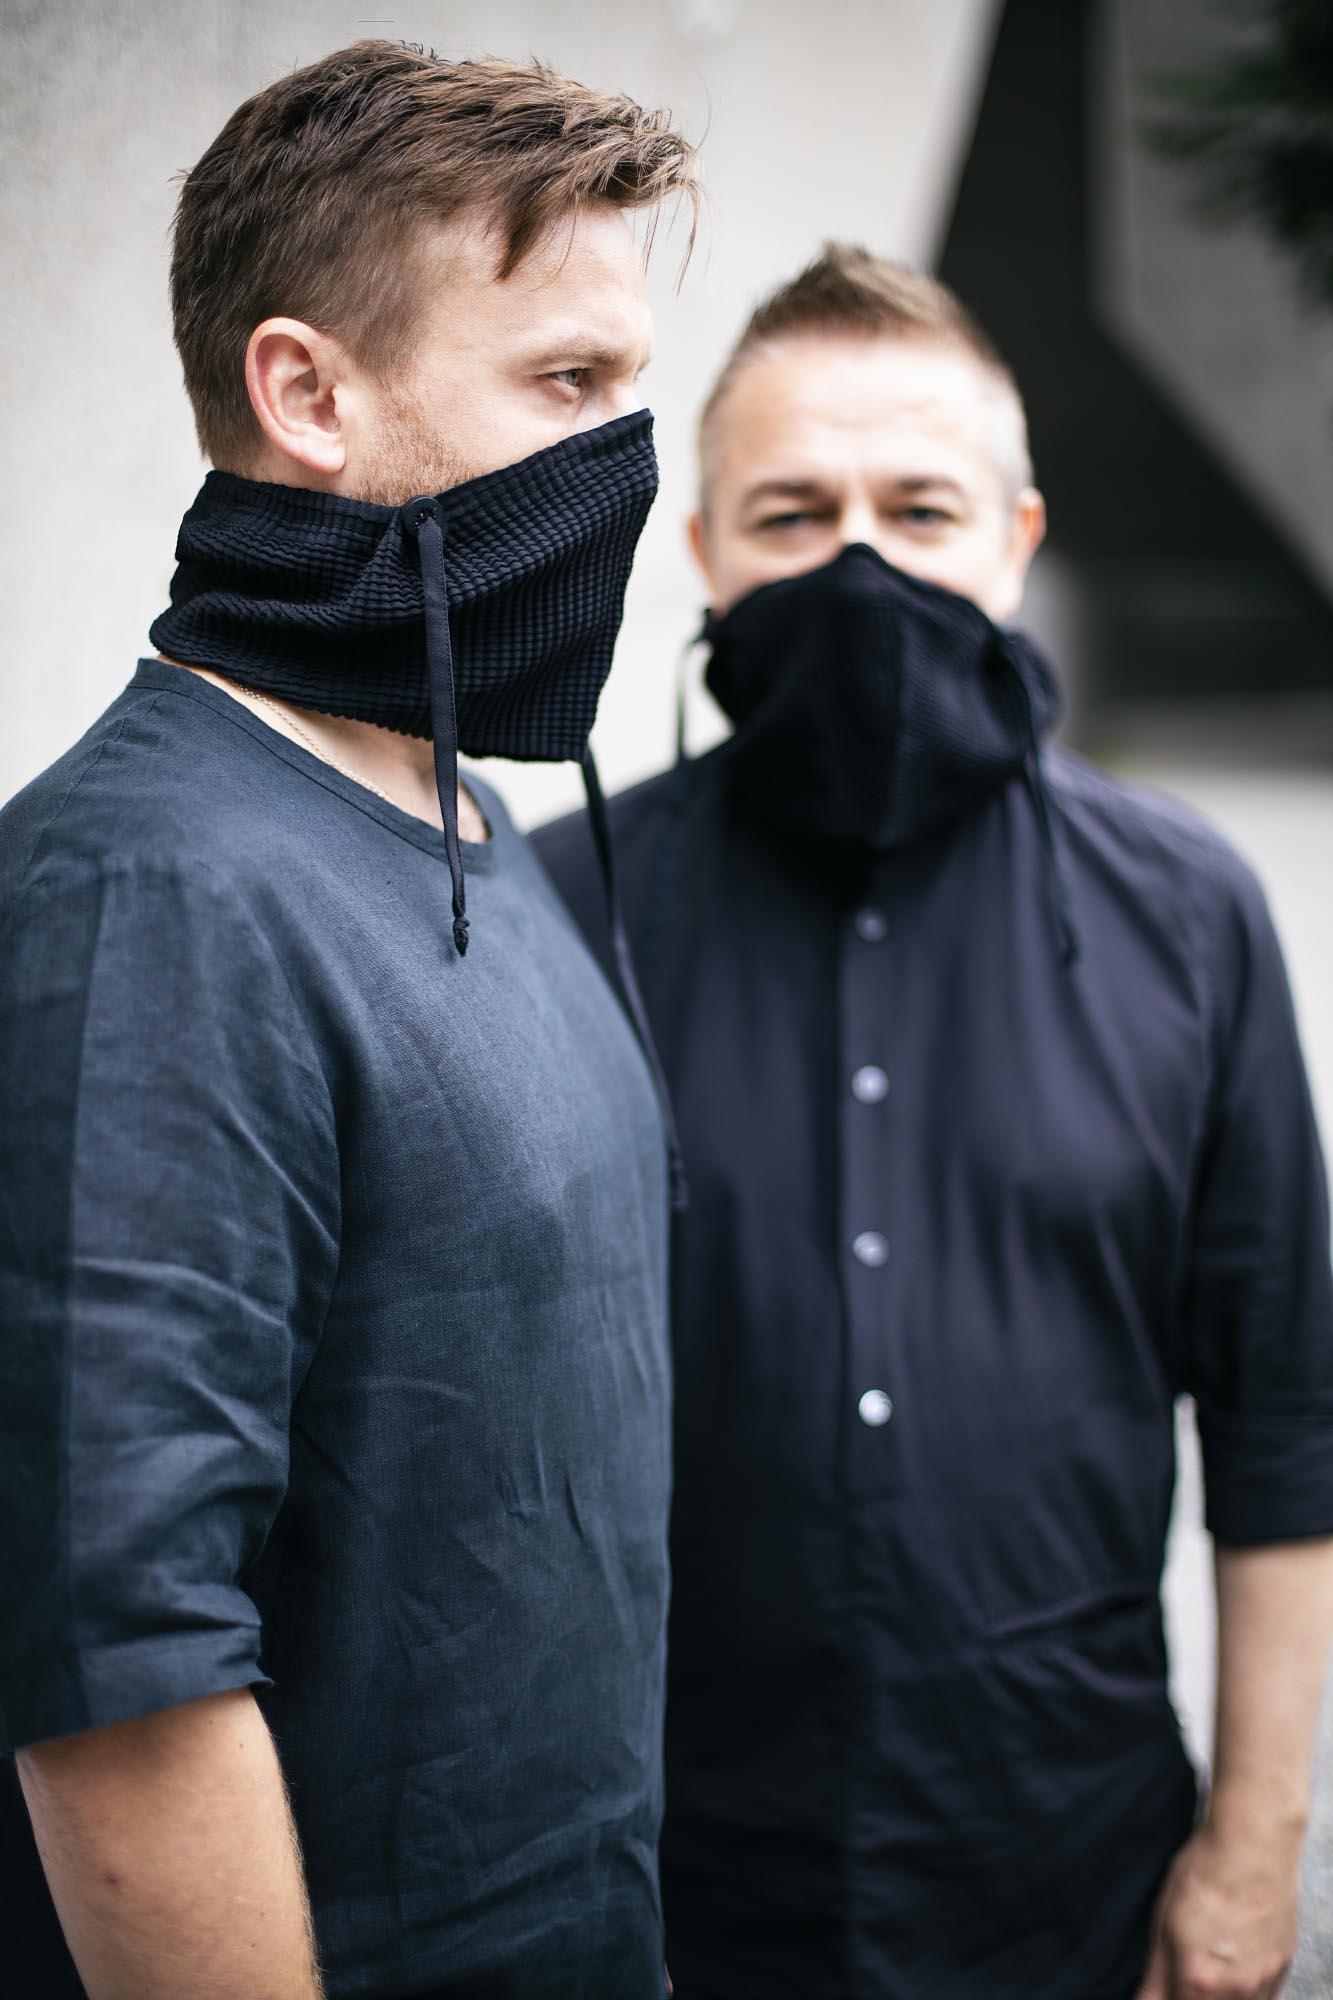 Sonia Trinkl-Couture-Design Corona Masken